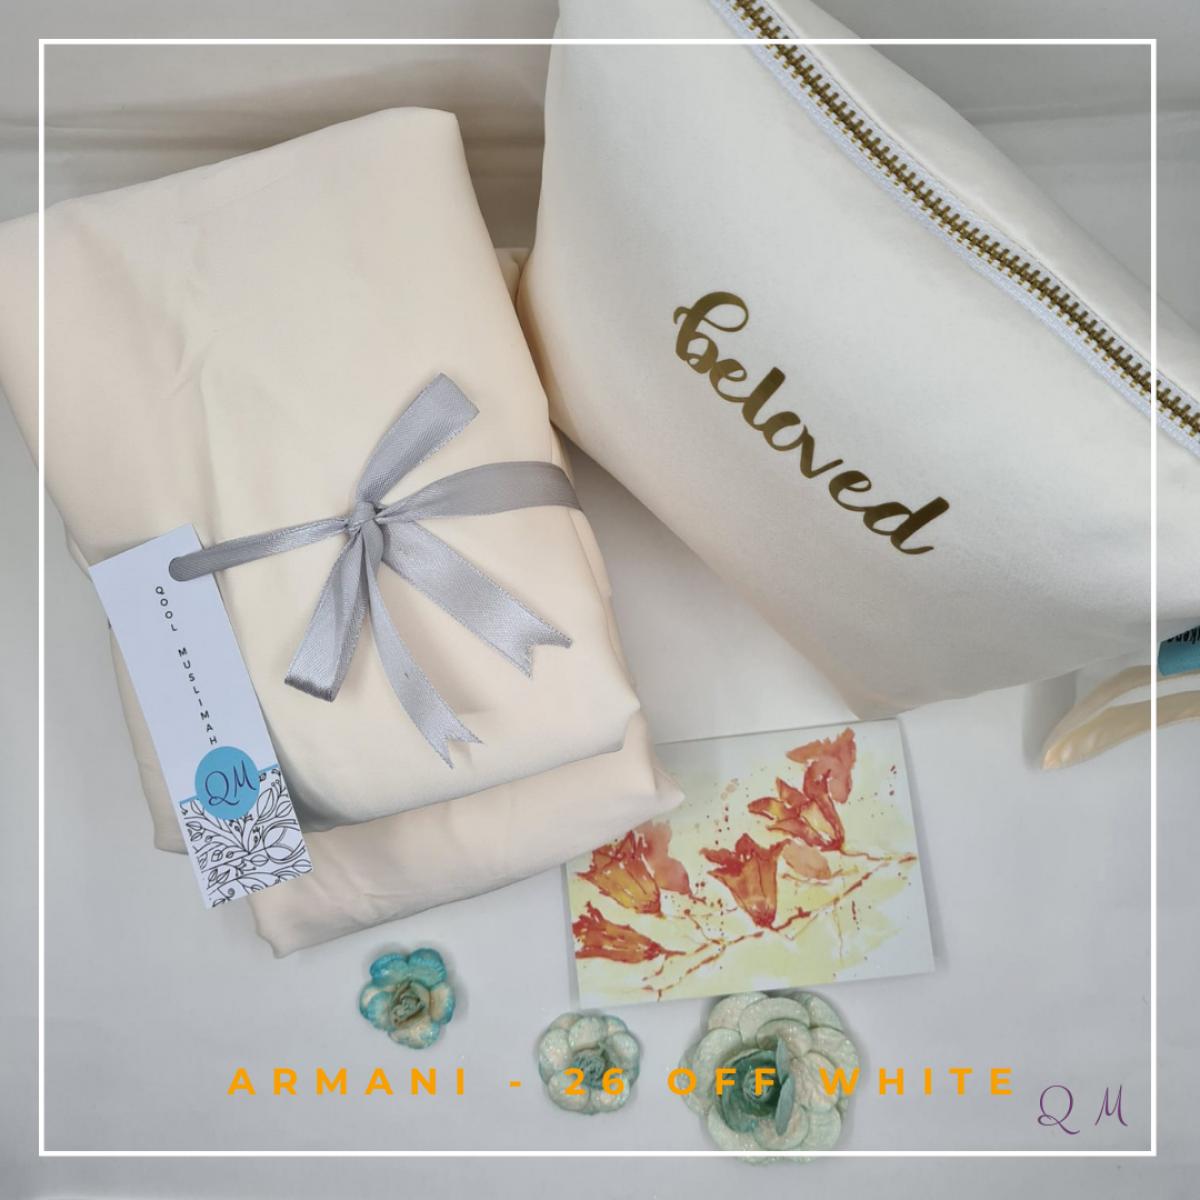 Telekung/Mukena Armani Silk - Off White - Qool Muslimah